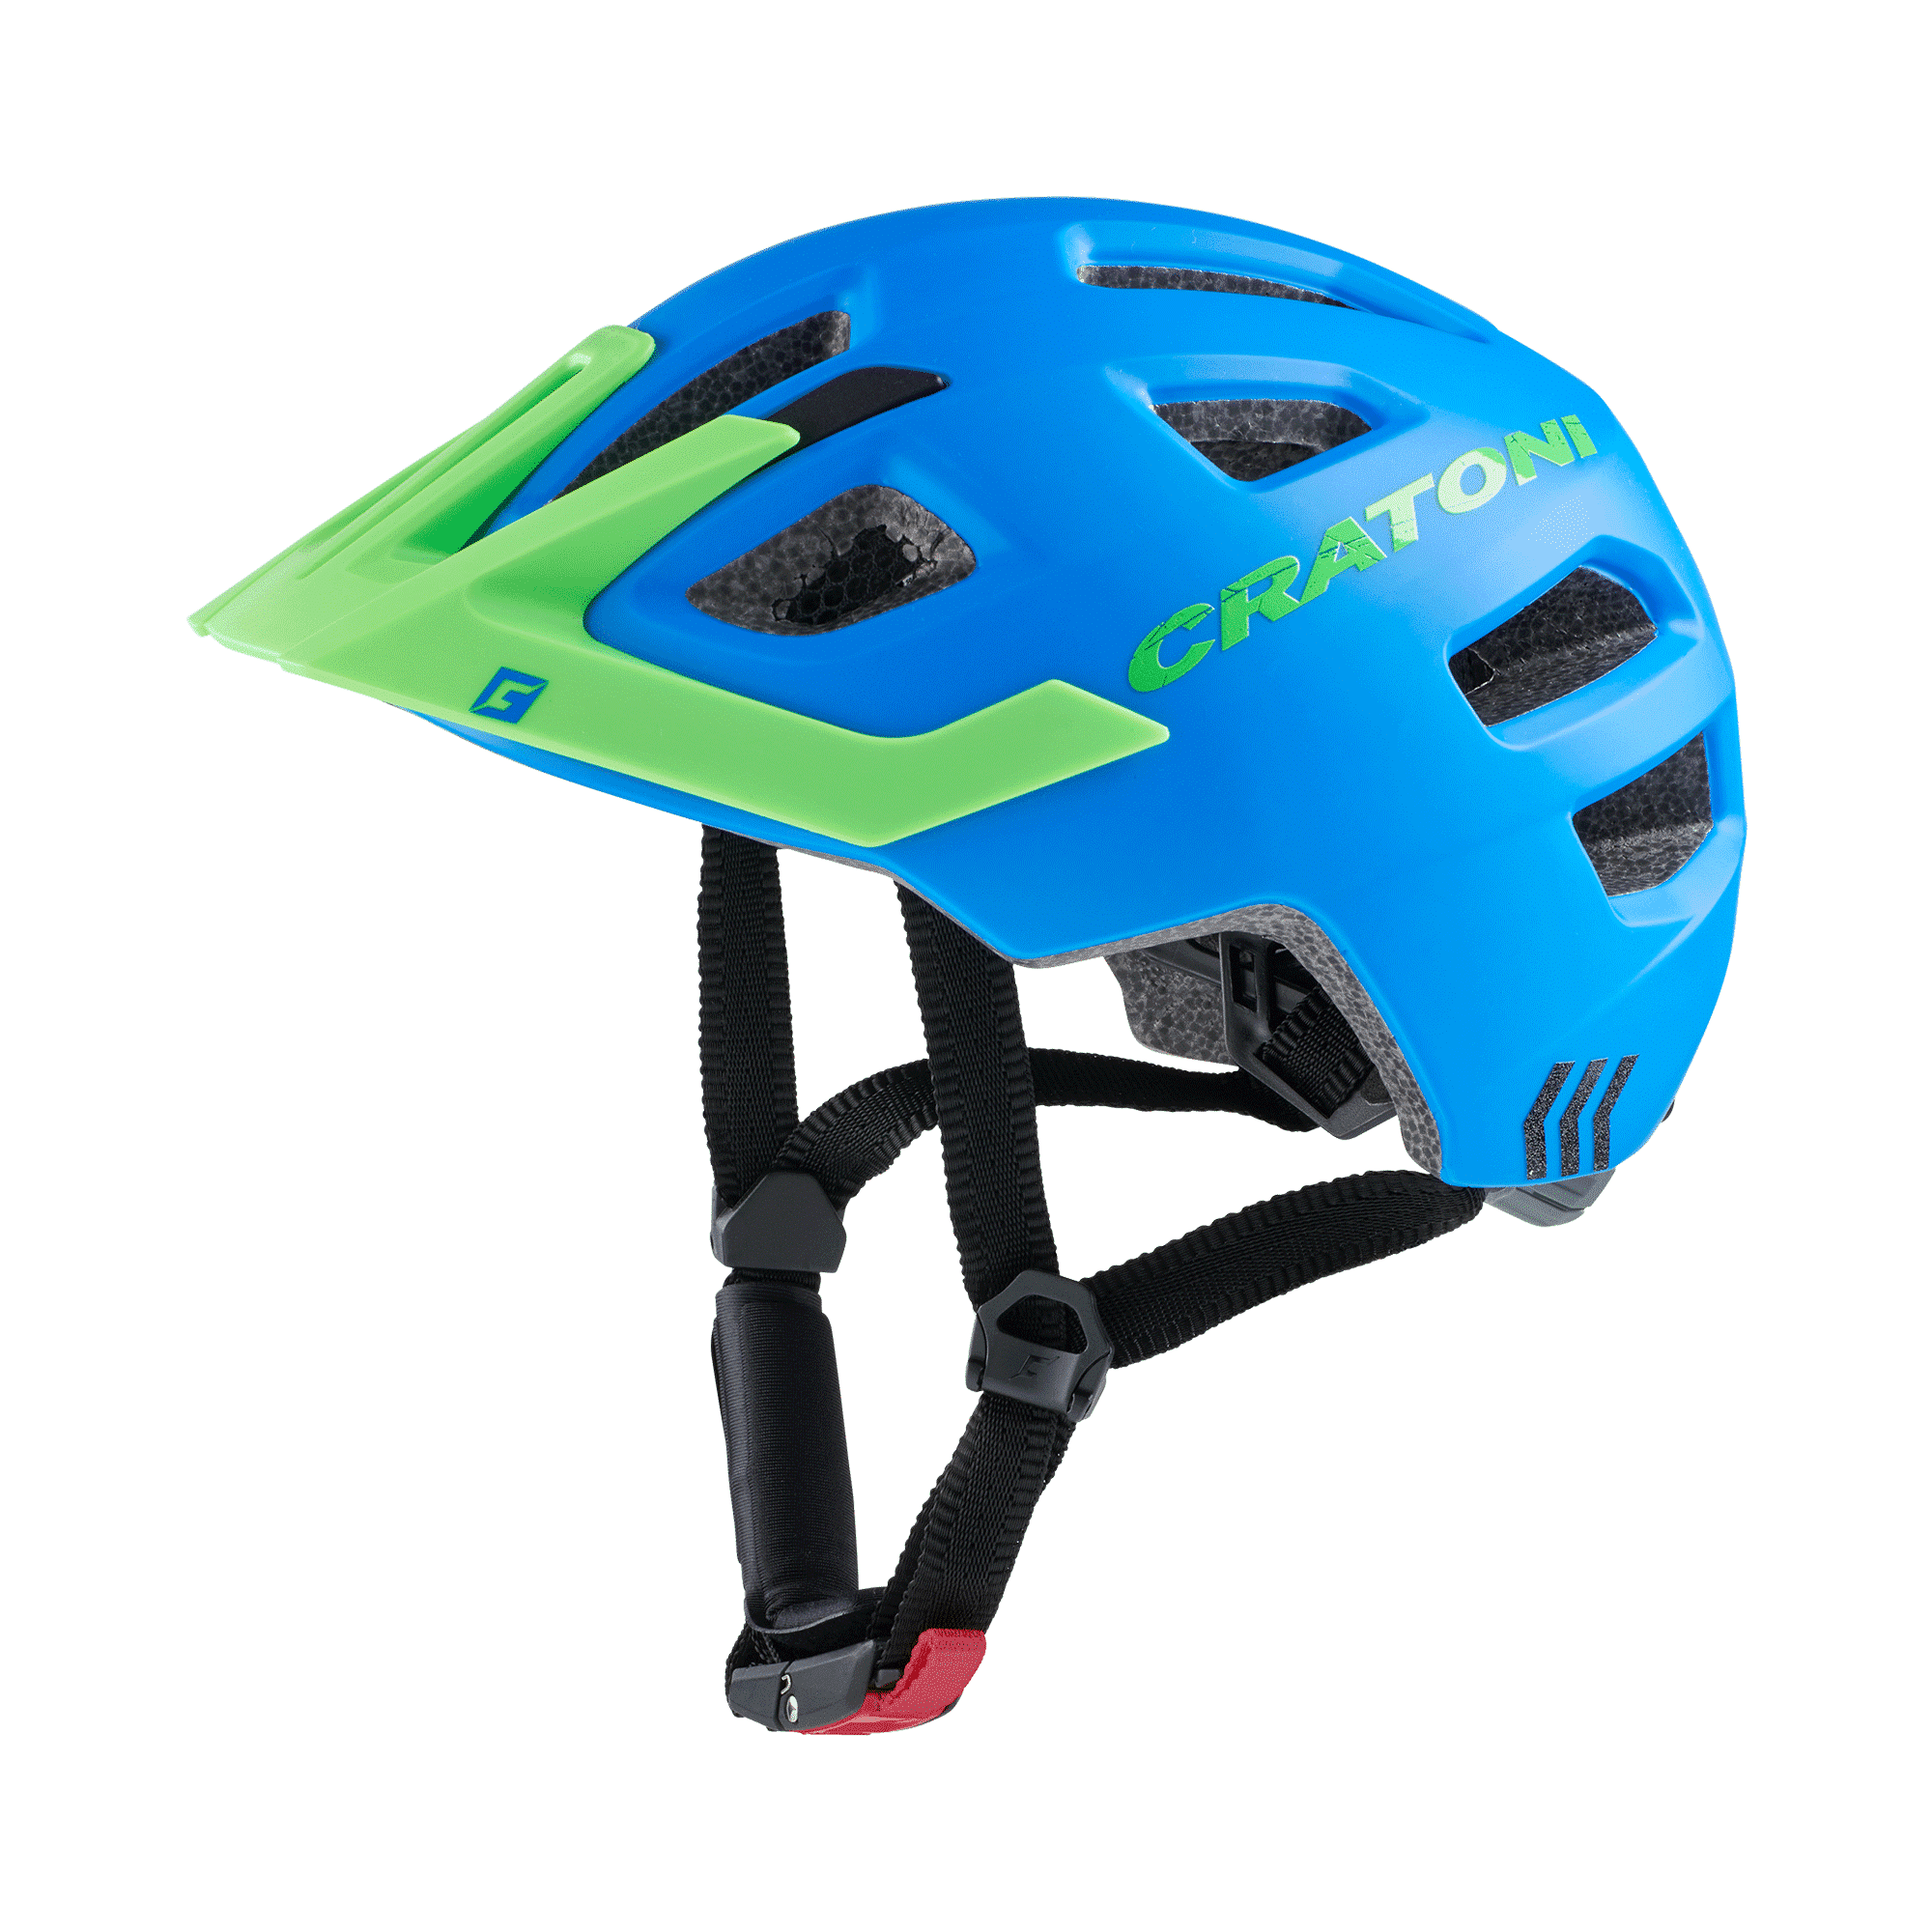 Maxster-Pro blue green matt